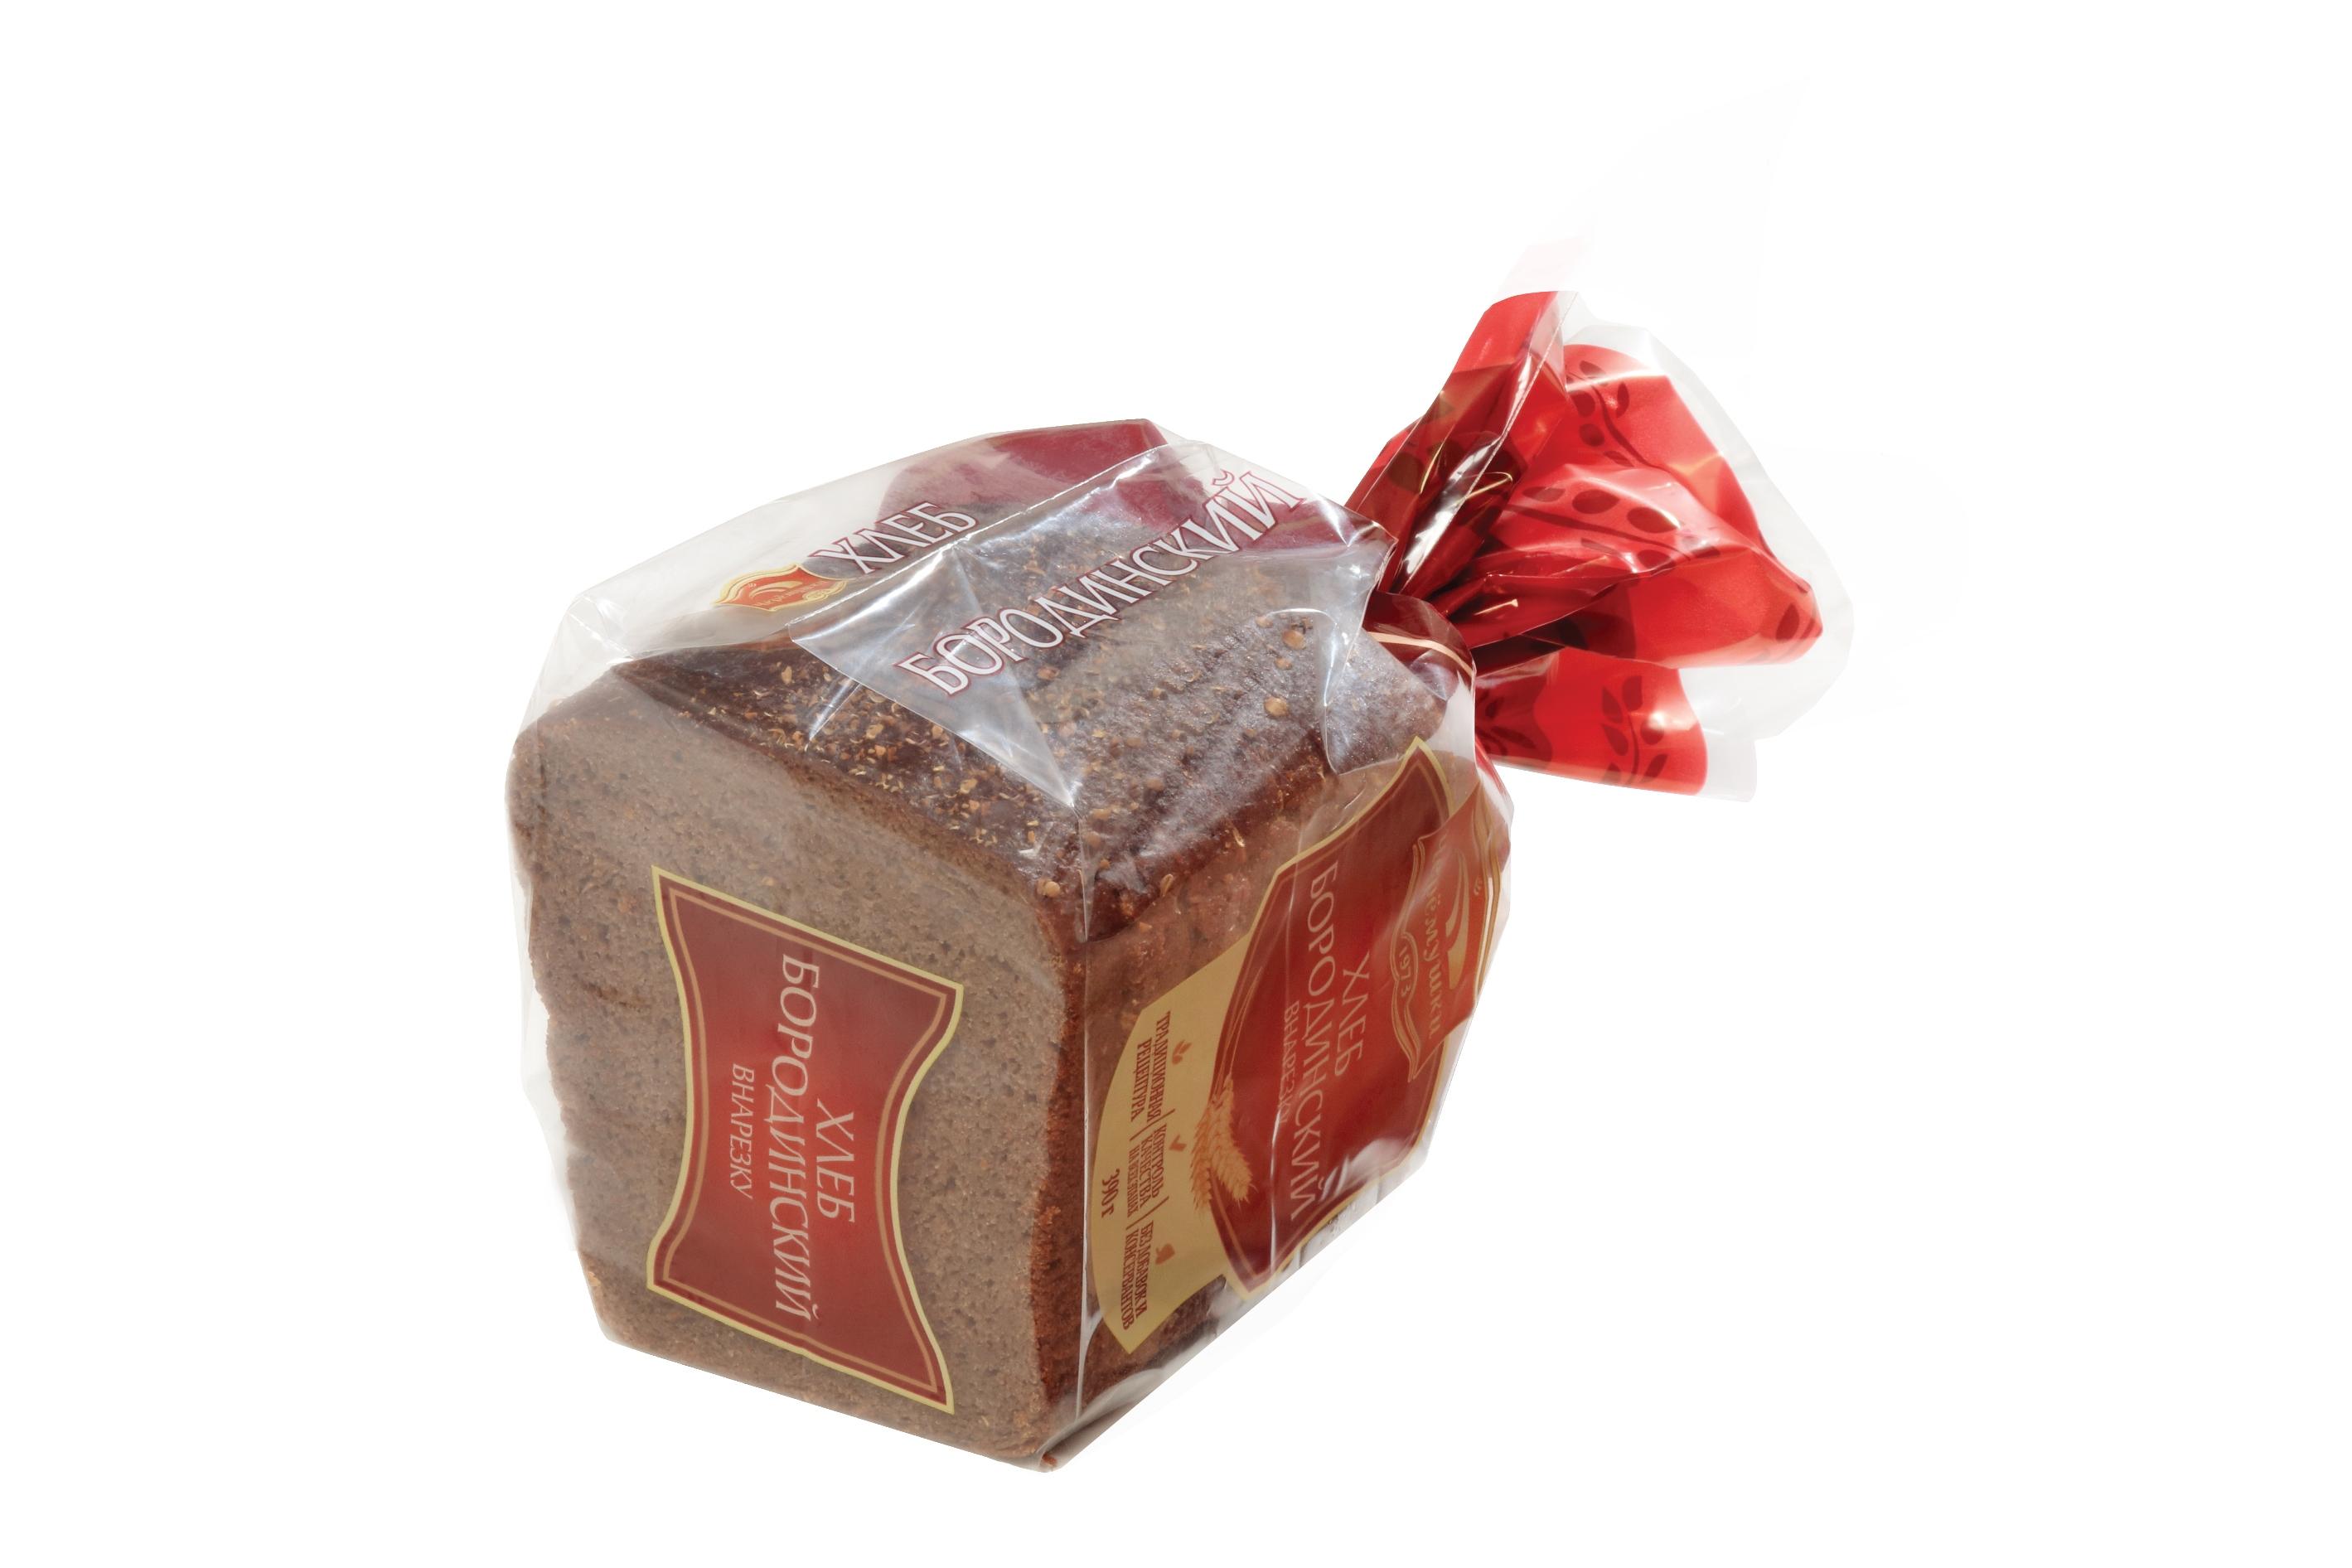 Хлеб Бородинский половина нарезка Черемушки